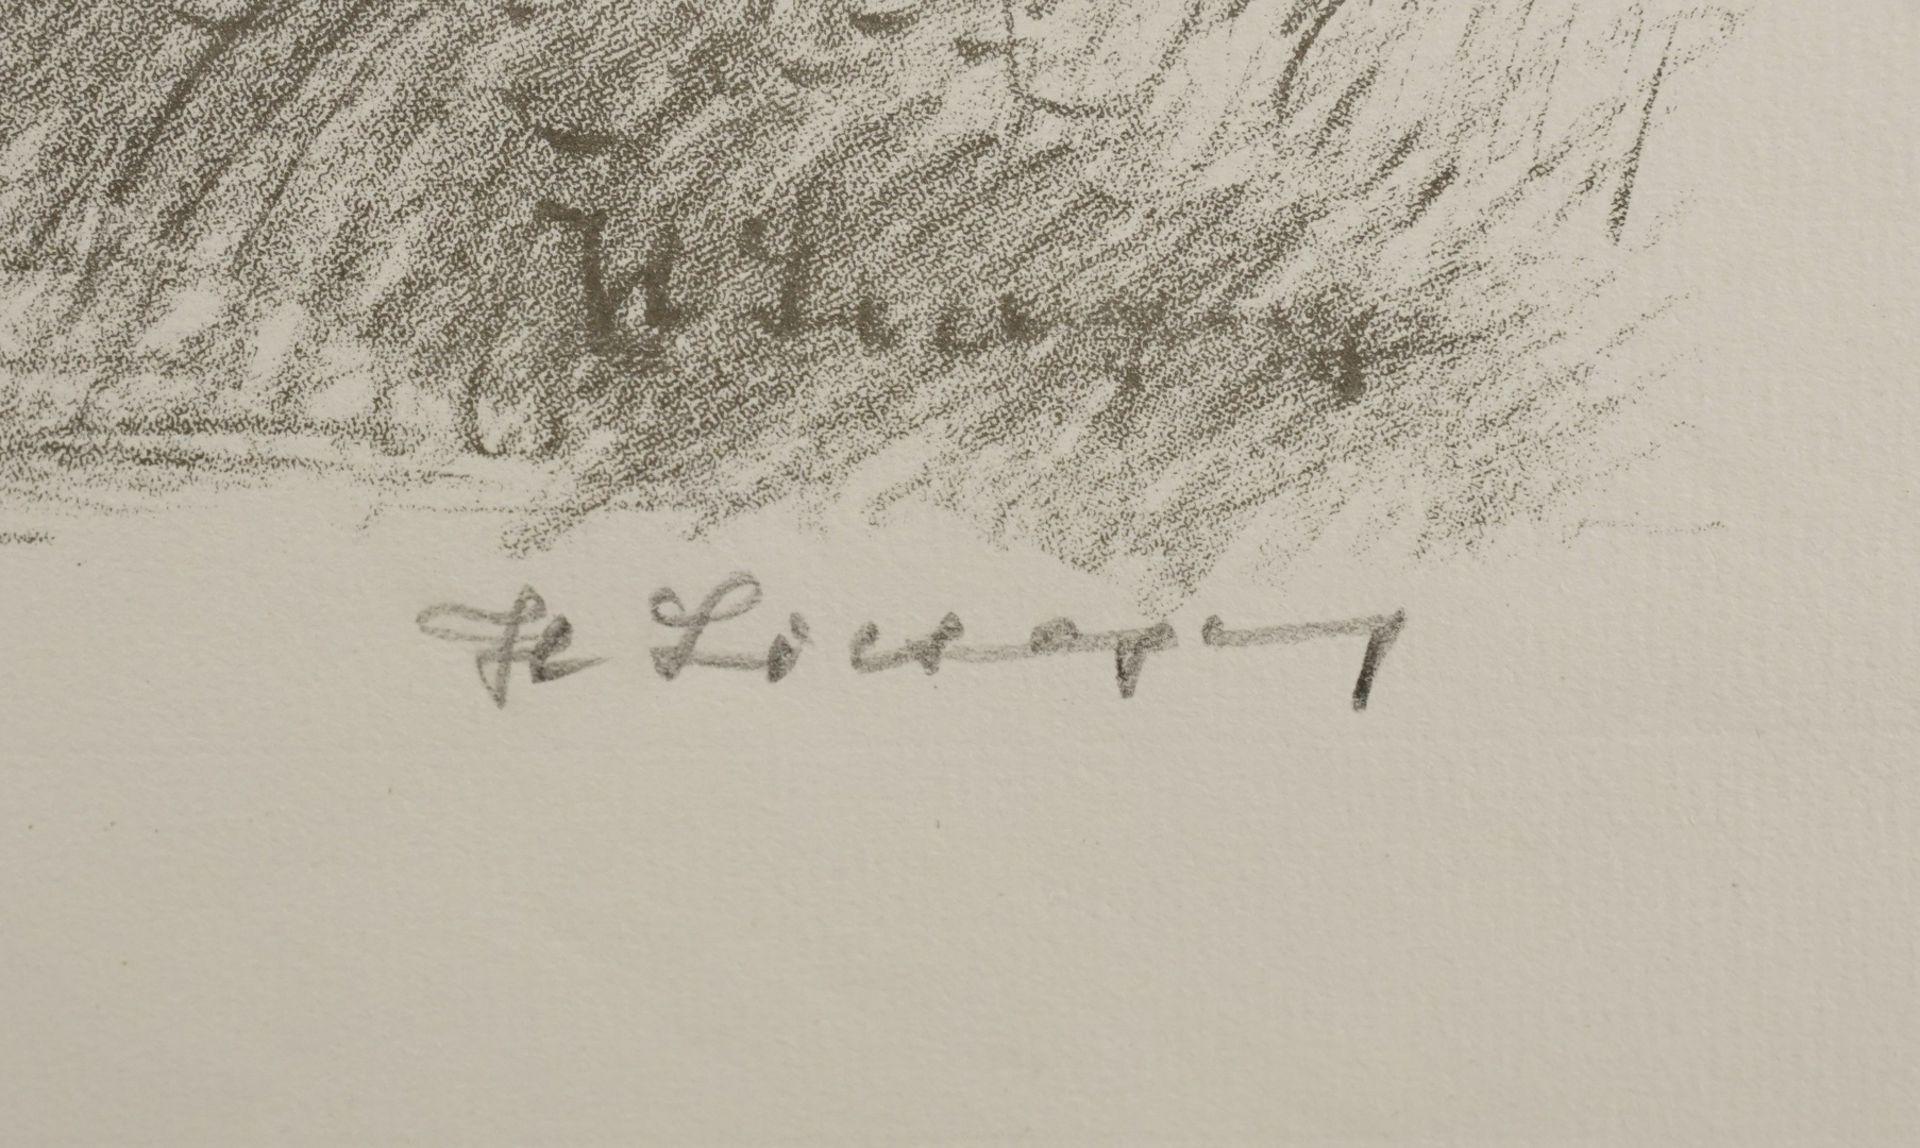 Helmuth Liesegang, Am Bach - Bild 4 aus 4